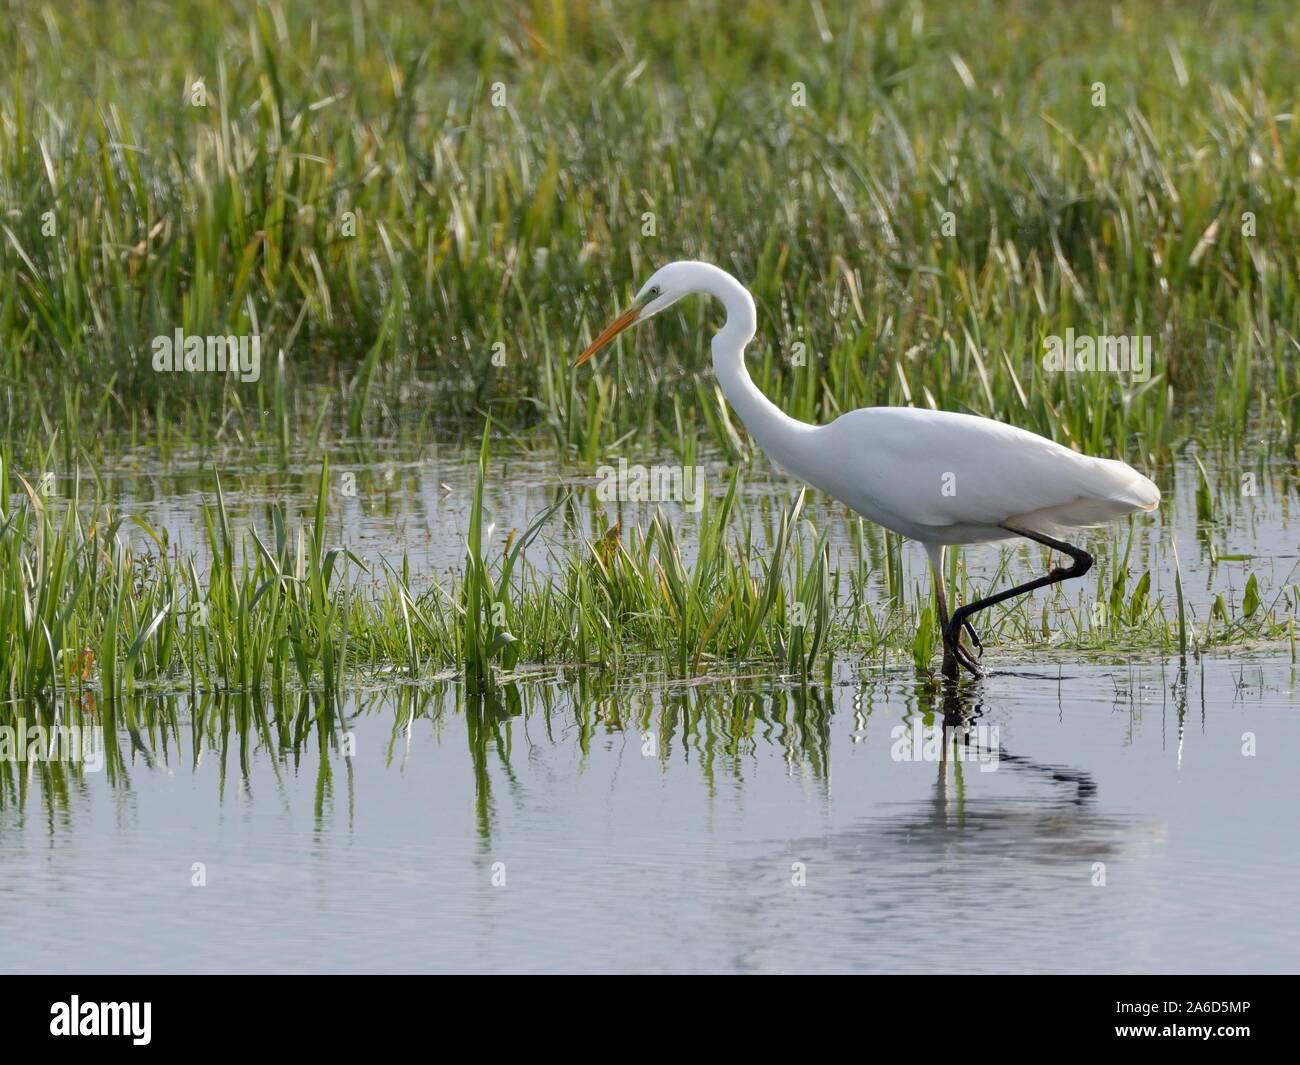 Great white egret (Egretta alba) hunting for fish in a marshland pool, Somerset Levels, UK, October. Stock Photo